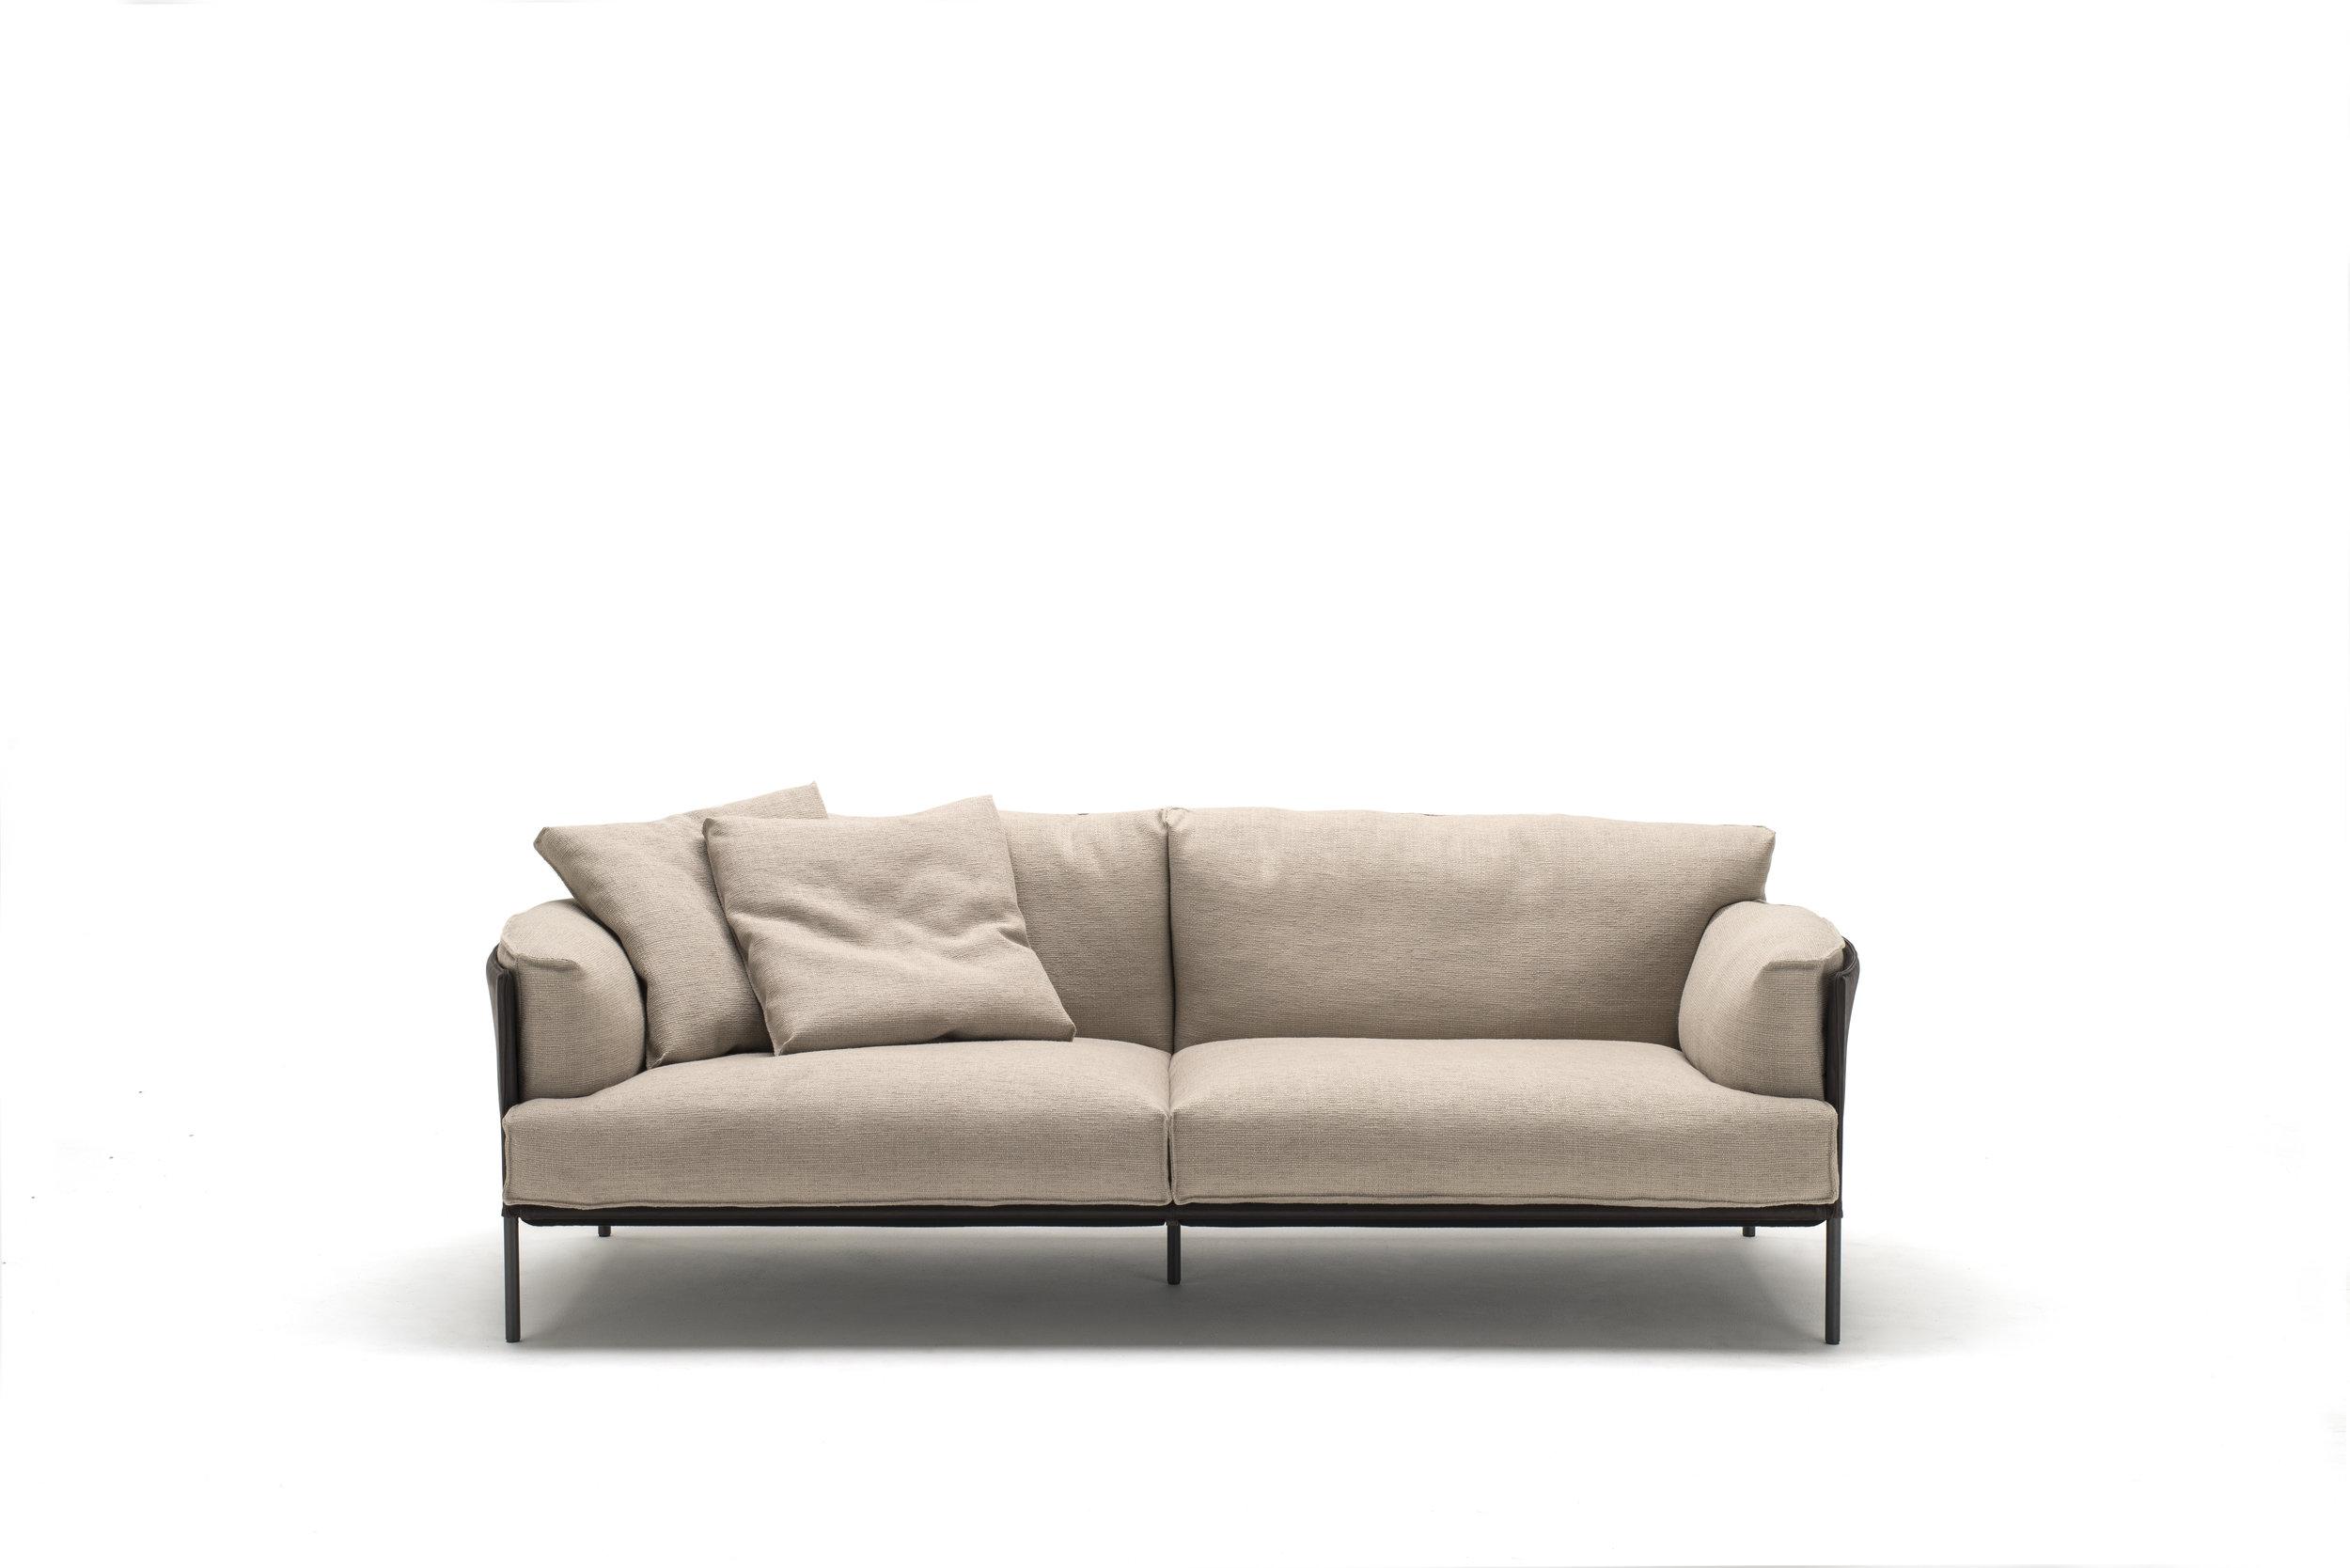 The Greene sofa designed by David Lopez Quincoces. Image © Living Divani.